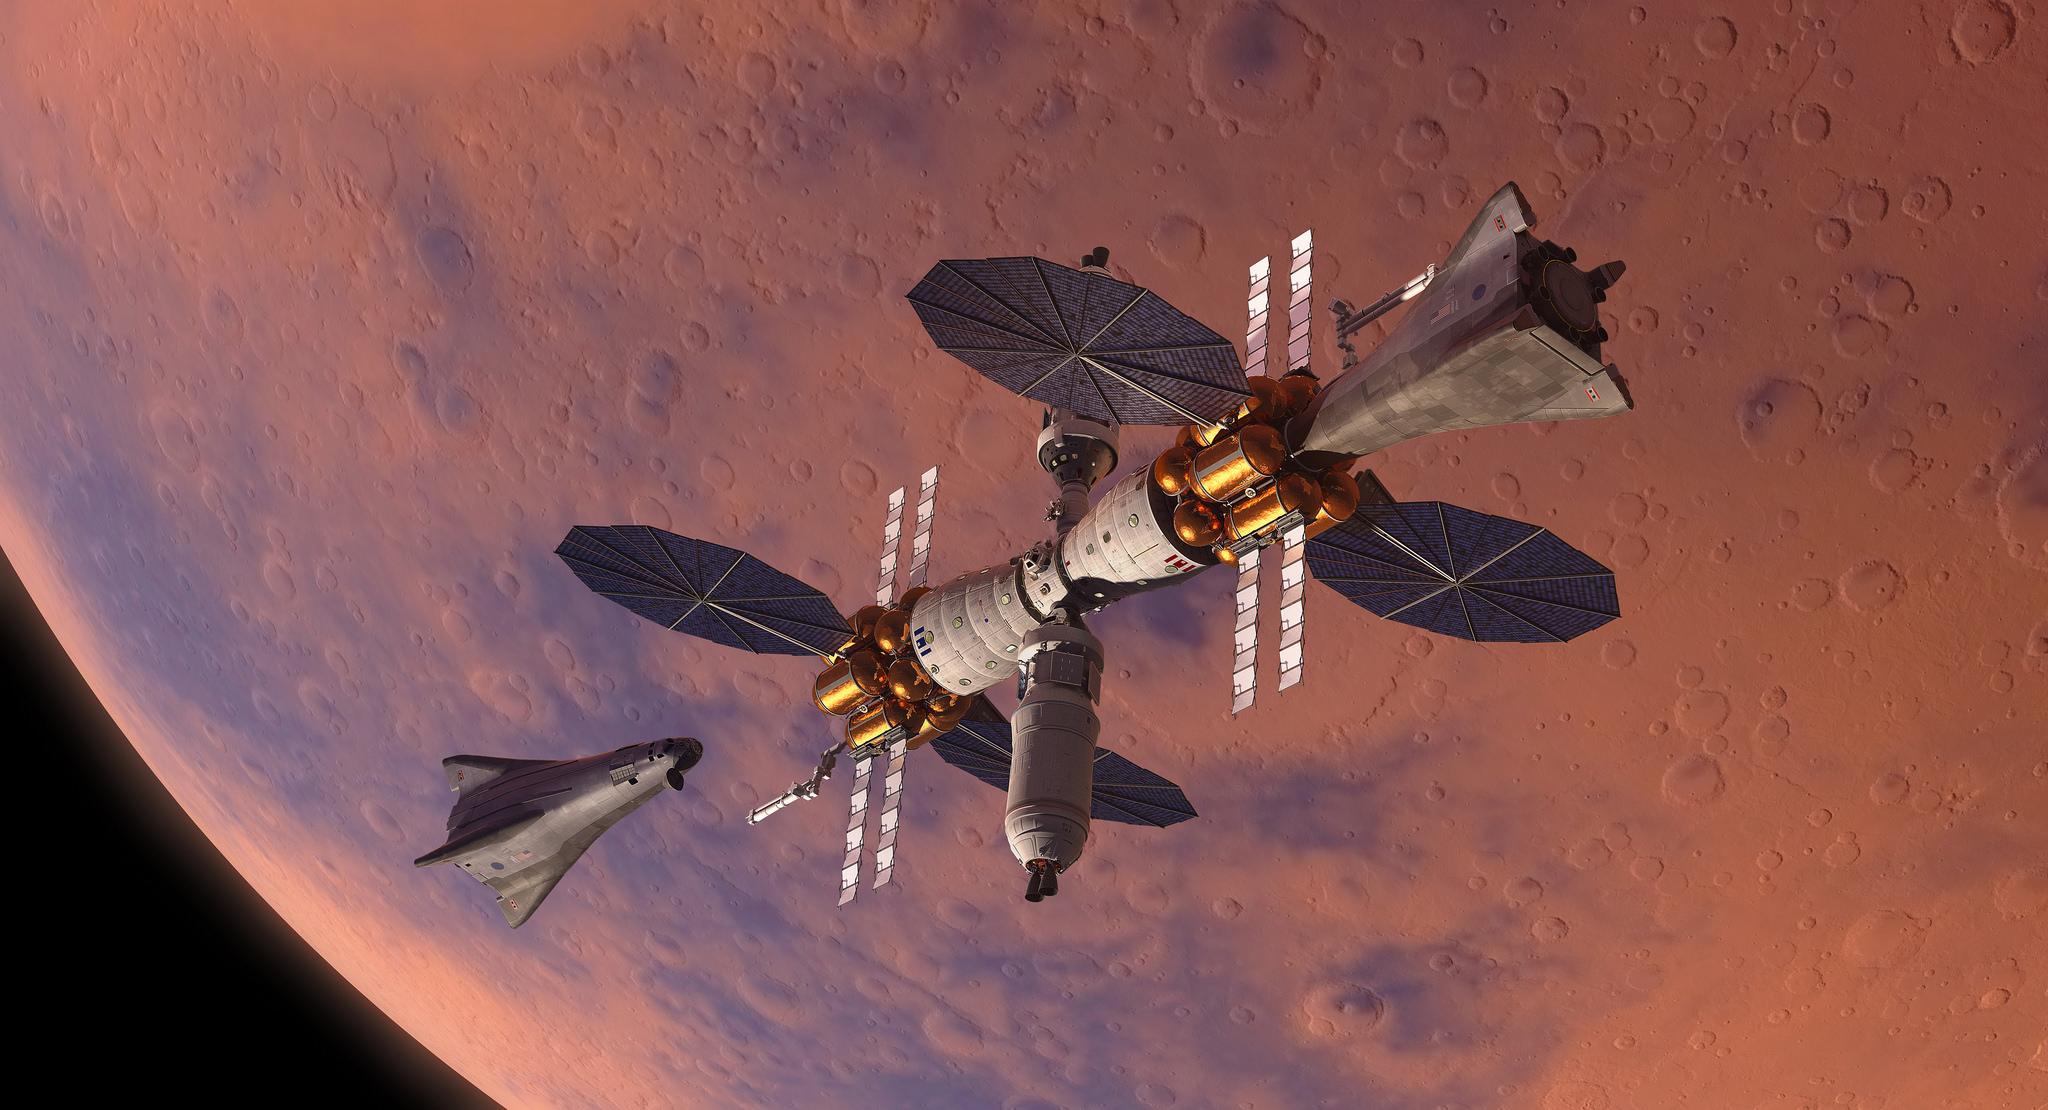 Lockheed Martin et son DSG (Deep Space Gateway)    - Page 3 37272639941_d86a86facb_k